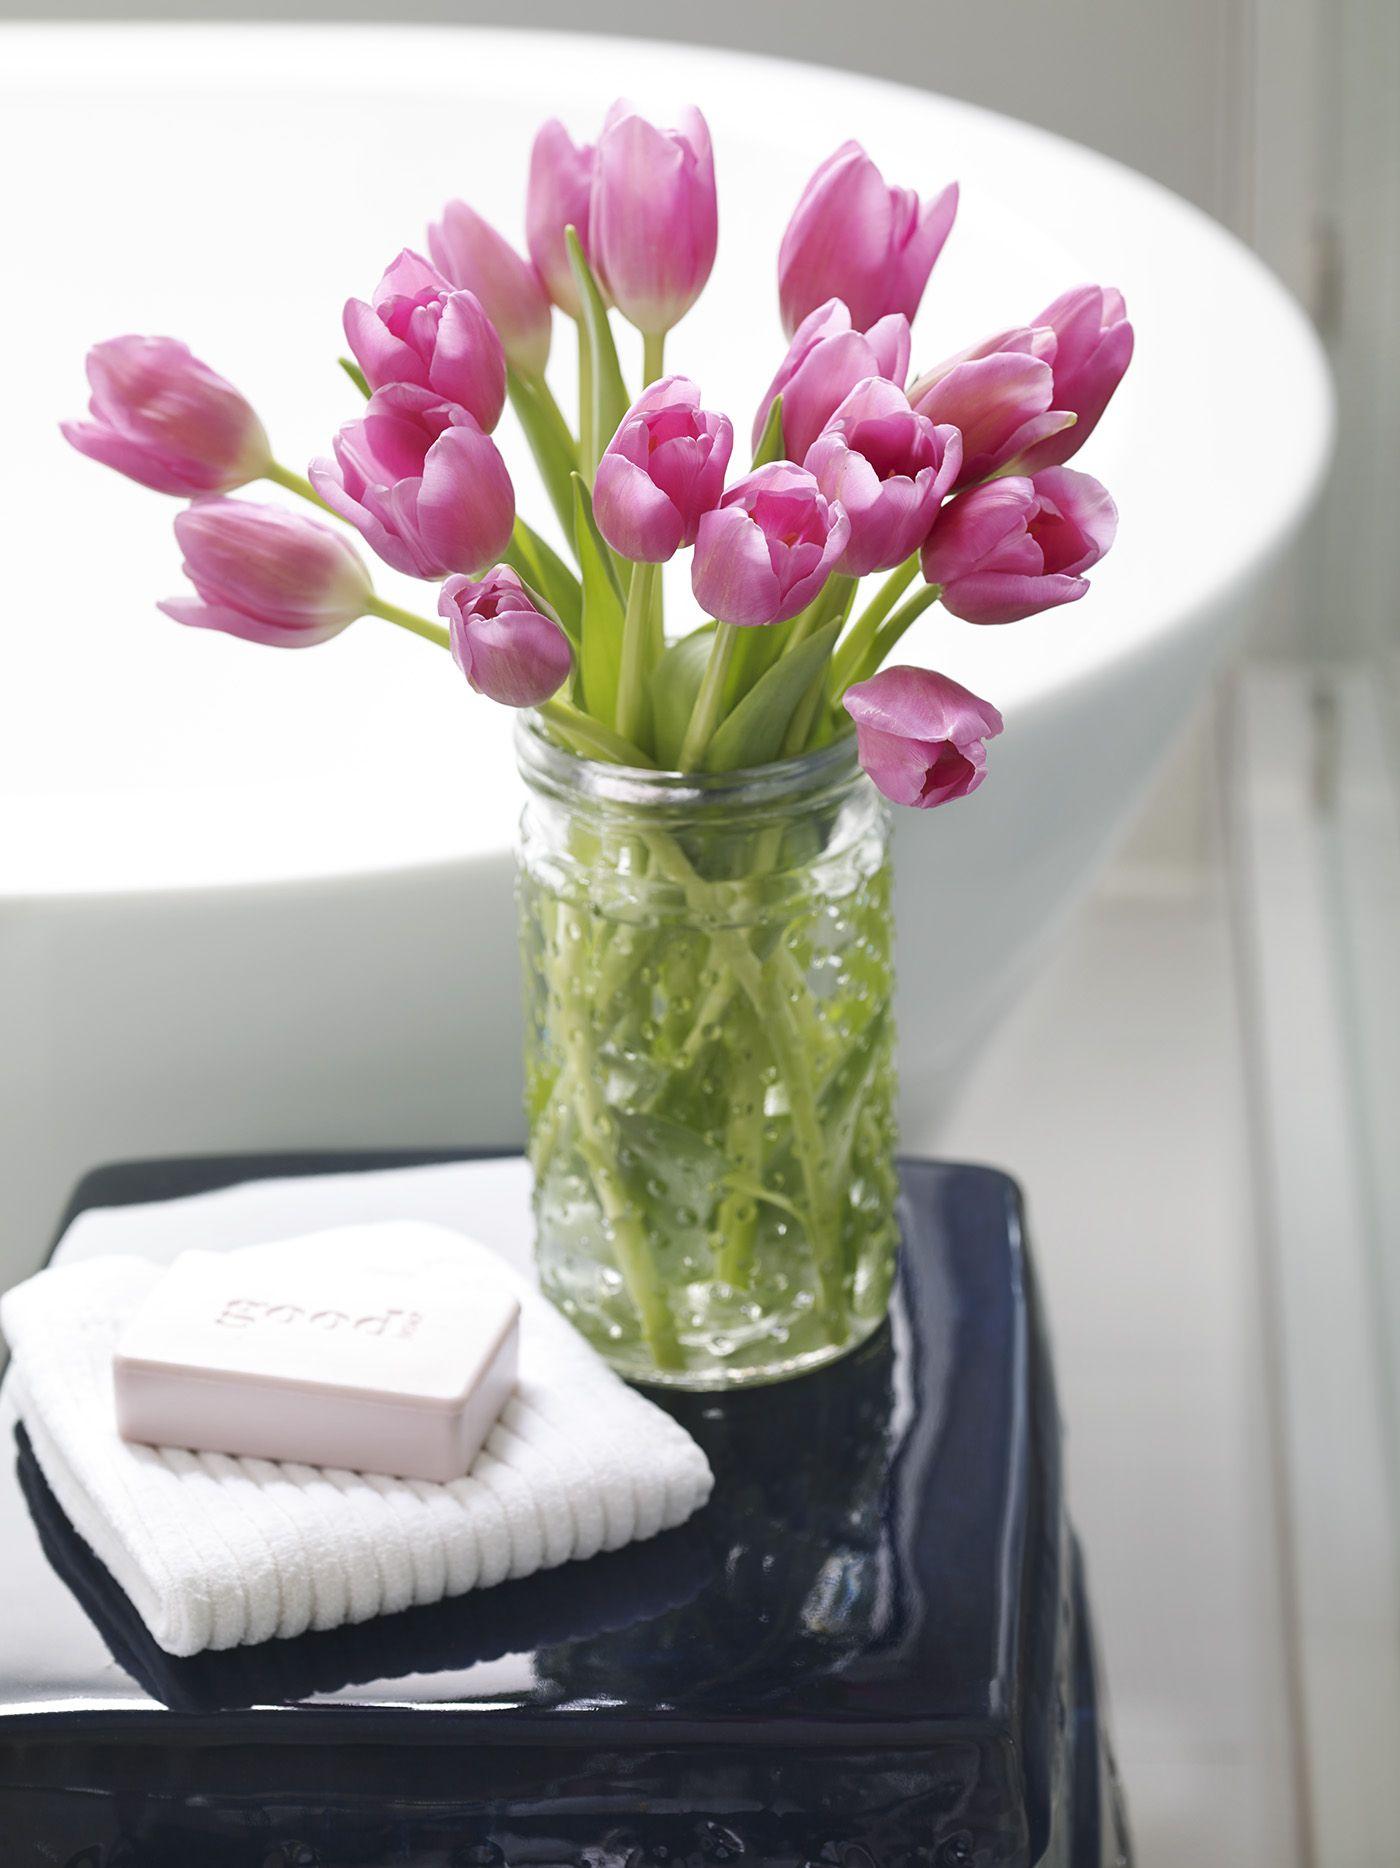 Help Your Fresh Flowers Last Longer With These Tips Flowers Last Longer Tulips Garden Bulbs